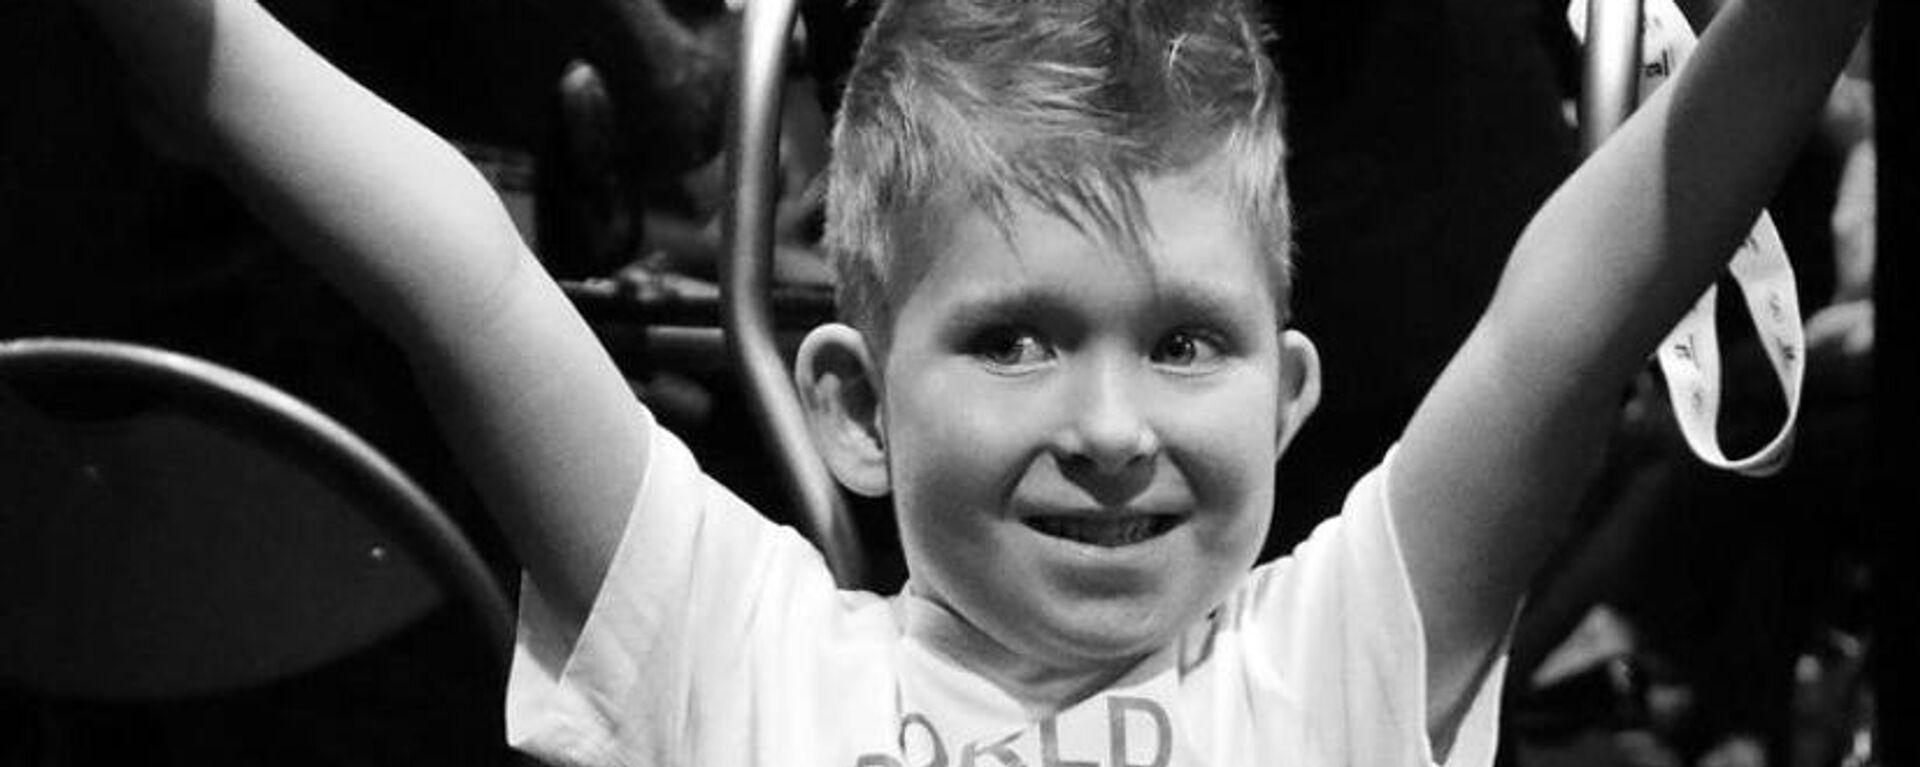 To αγόρι χωρίς εγκέφαλο: Το παιδί - θαύμα που κατάφερε να επιβιώσει ενάντια σε όλες τις πιθανότητες  - Sputnik Ελλάδα, 1920, 22.08.2021